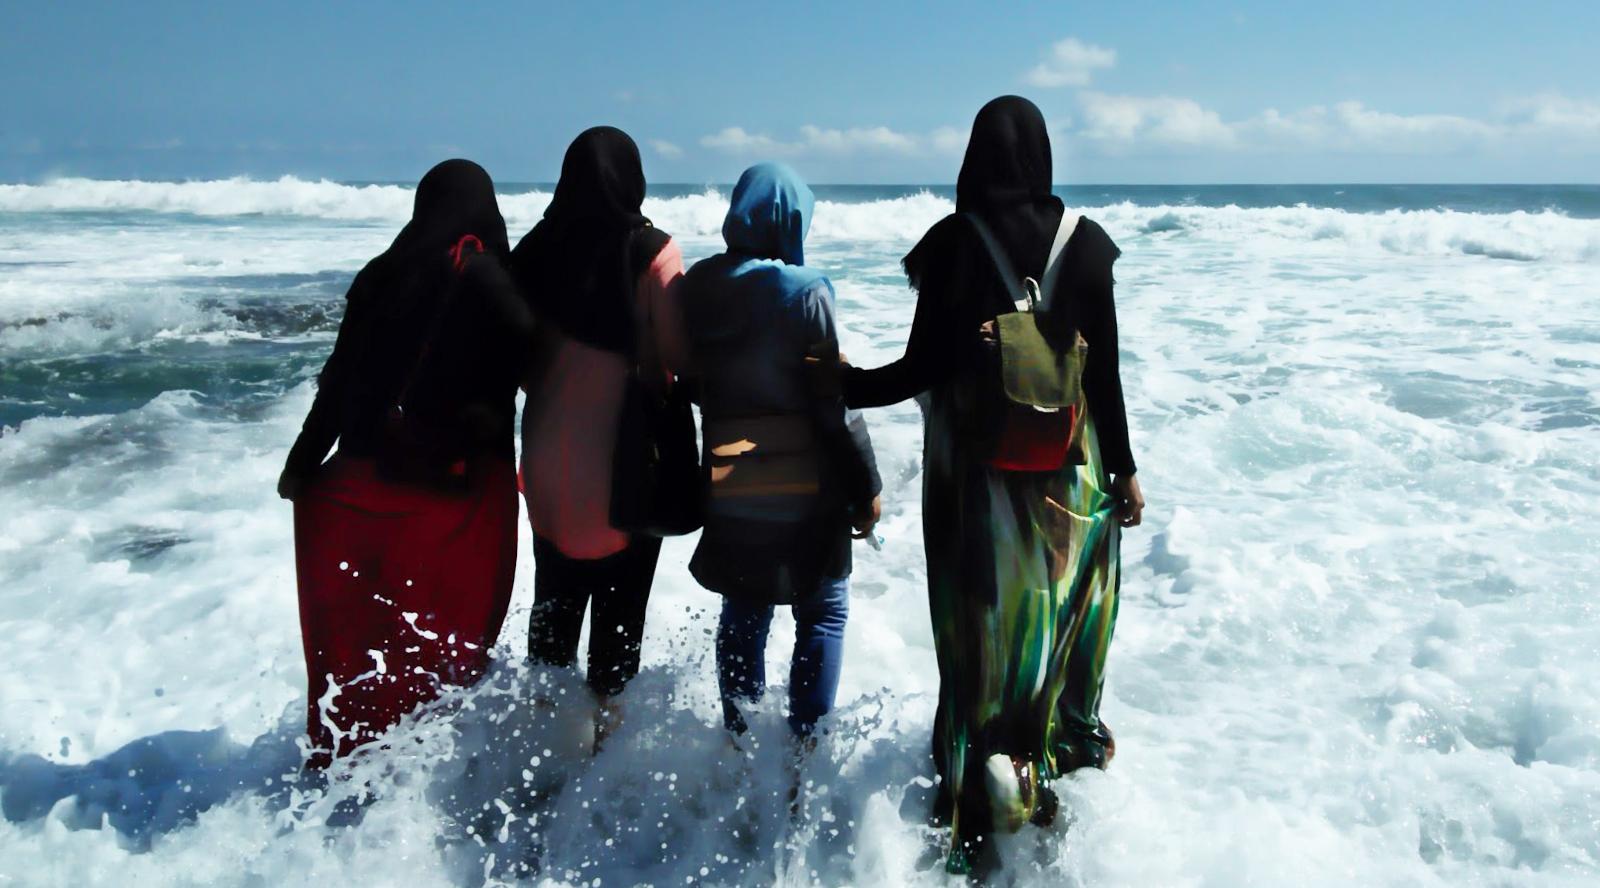 model hijab gaul terbaru trend hijab gaul